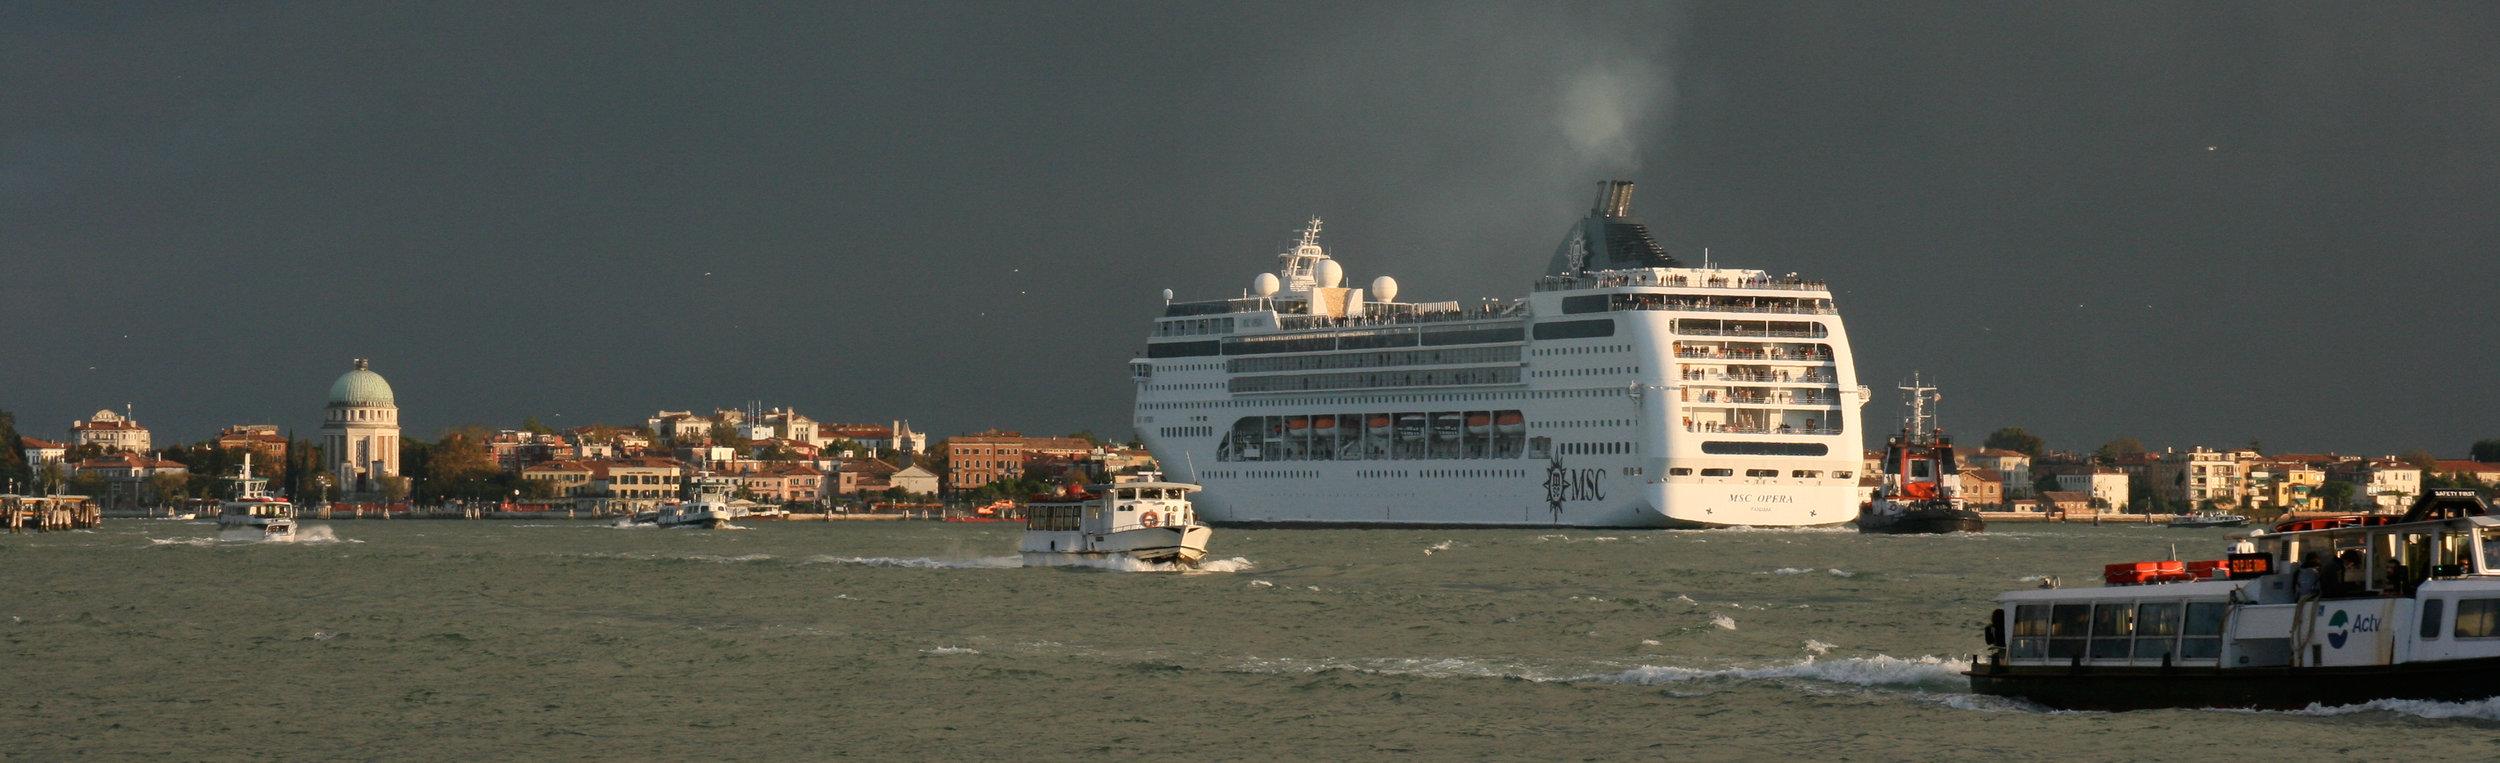 cruise ship venice.jpg